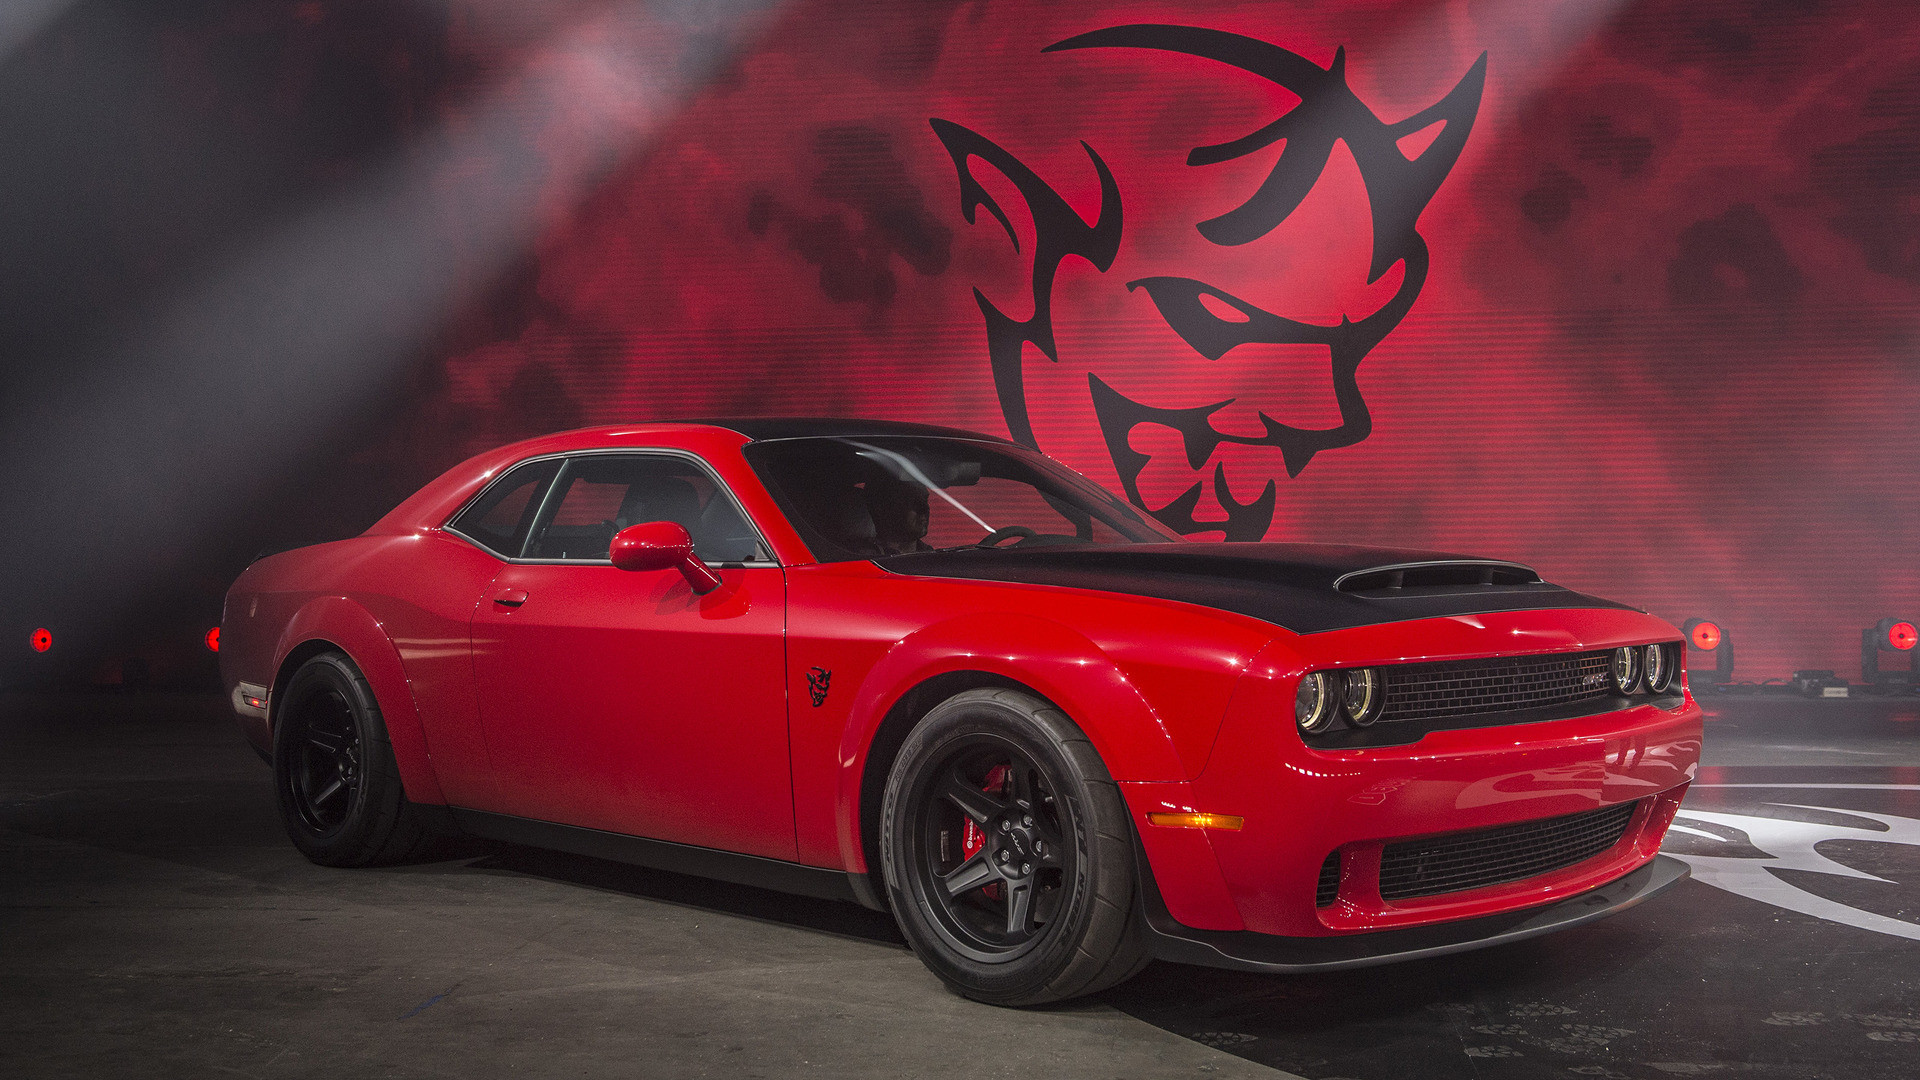 2018 Dodge Challenger Srt Demon Wallpaper Data Src Demon Dodge Challenger Srt Hellcat 1920x1080 Download Hd Wallpaper Wallpapertip